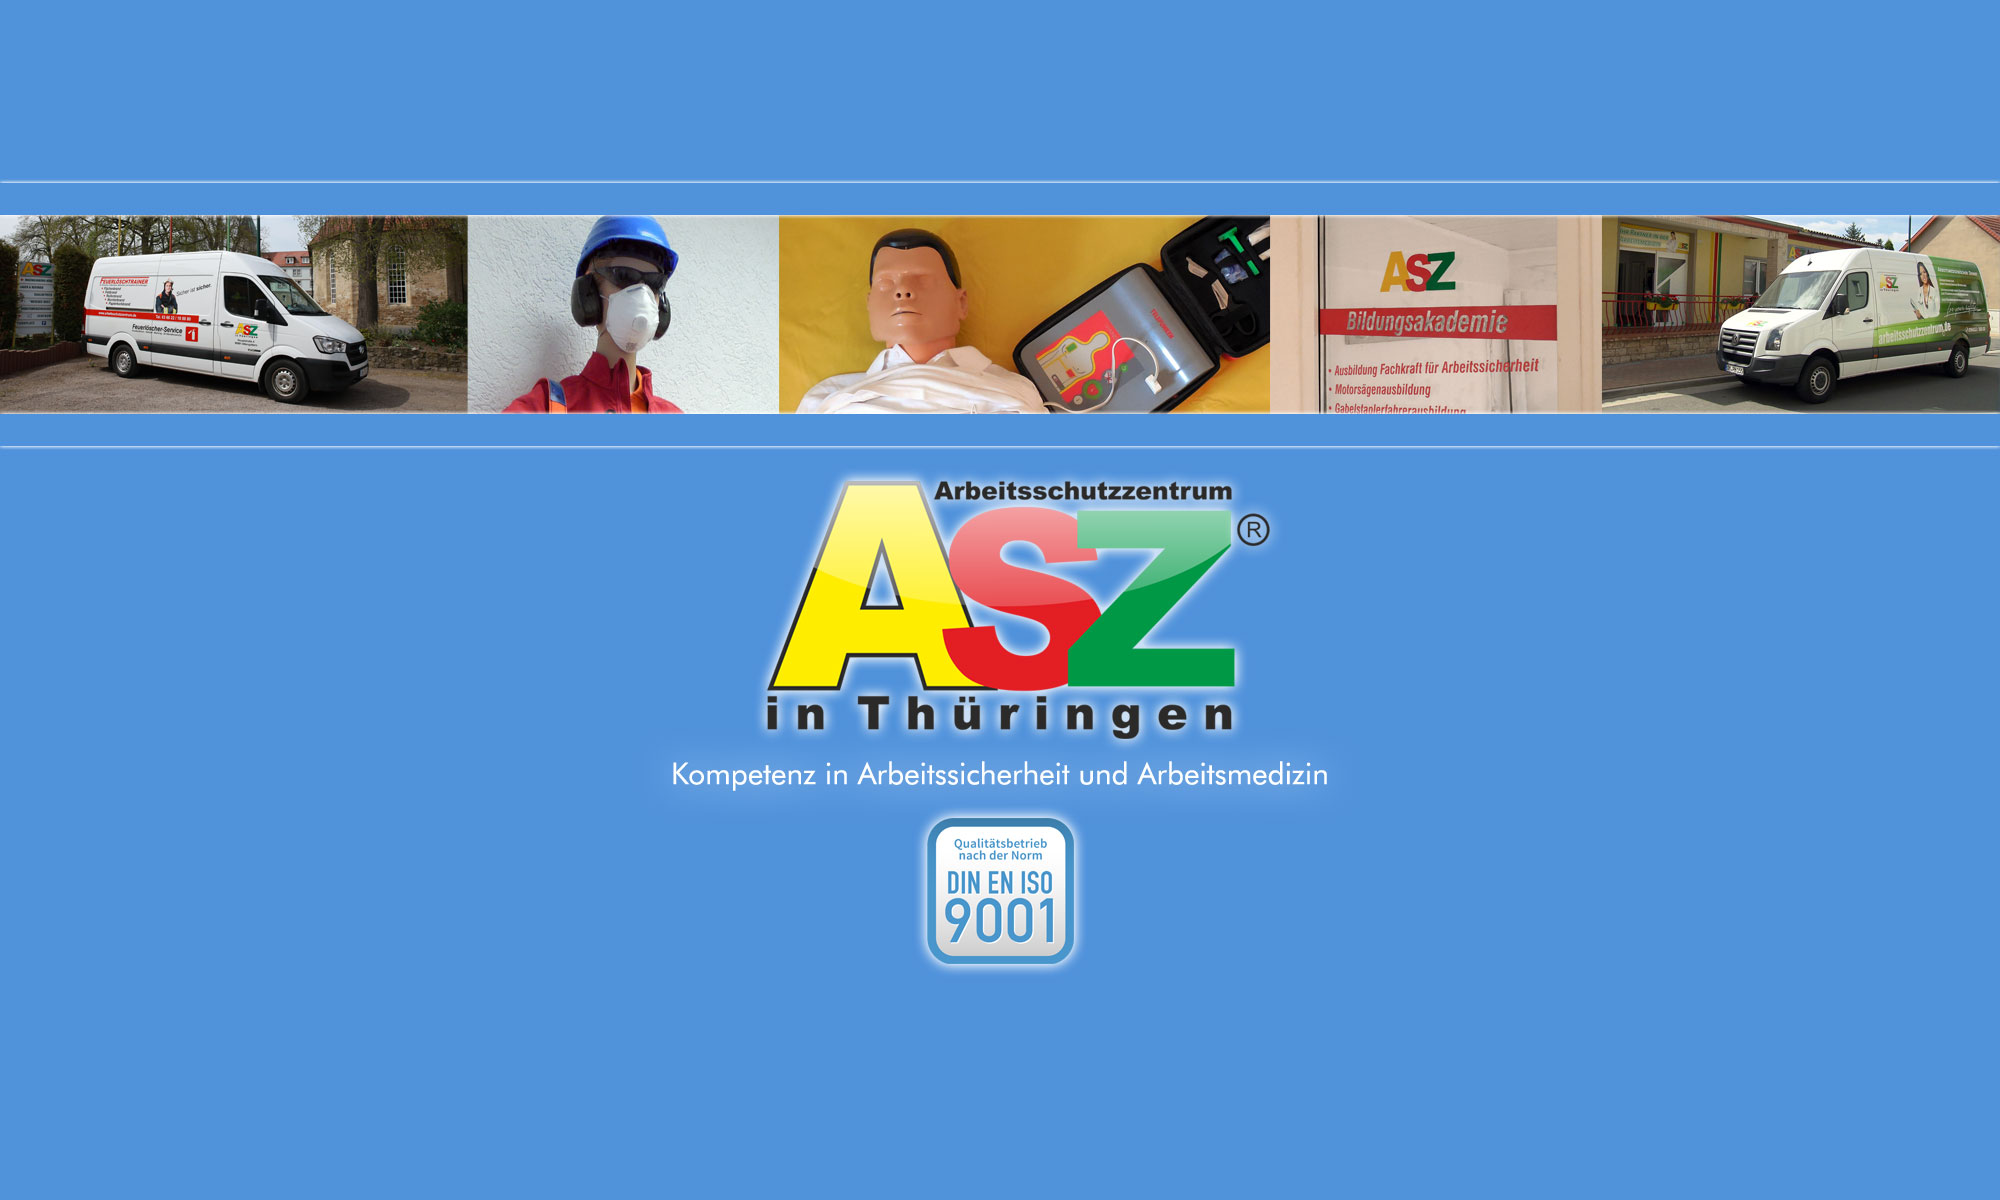 Arbeitsschutzzentrum in Thüringen